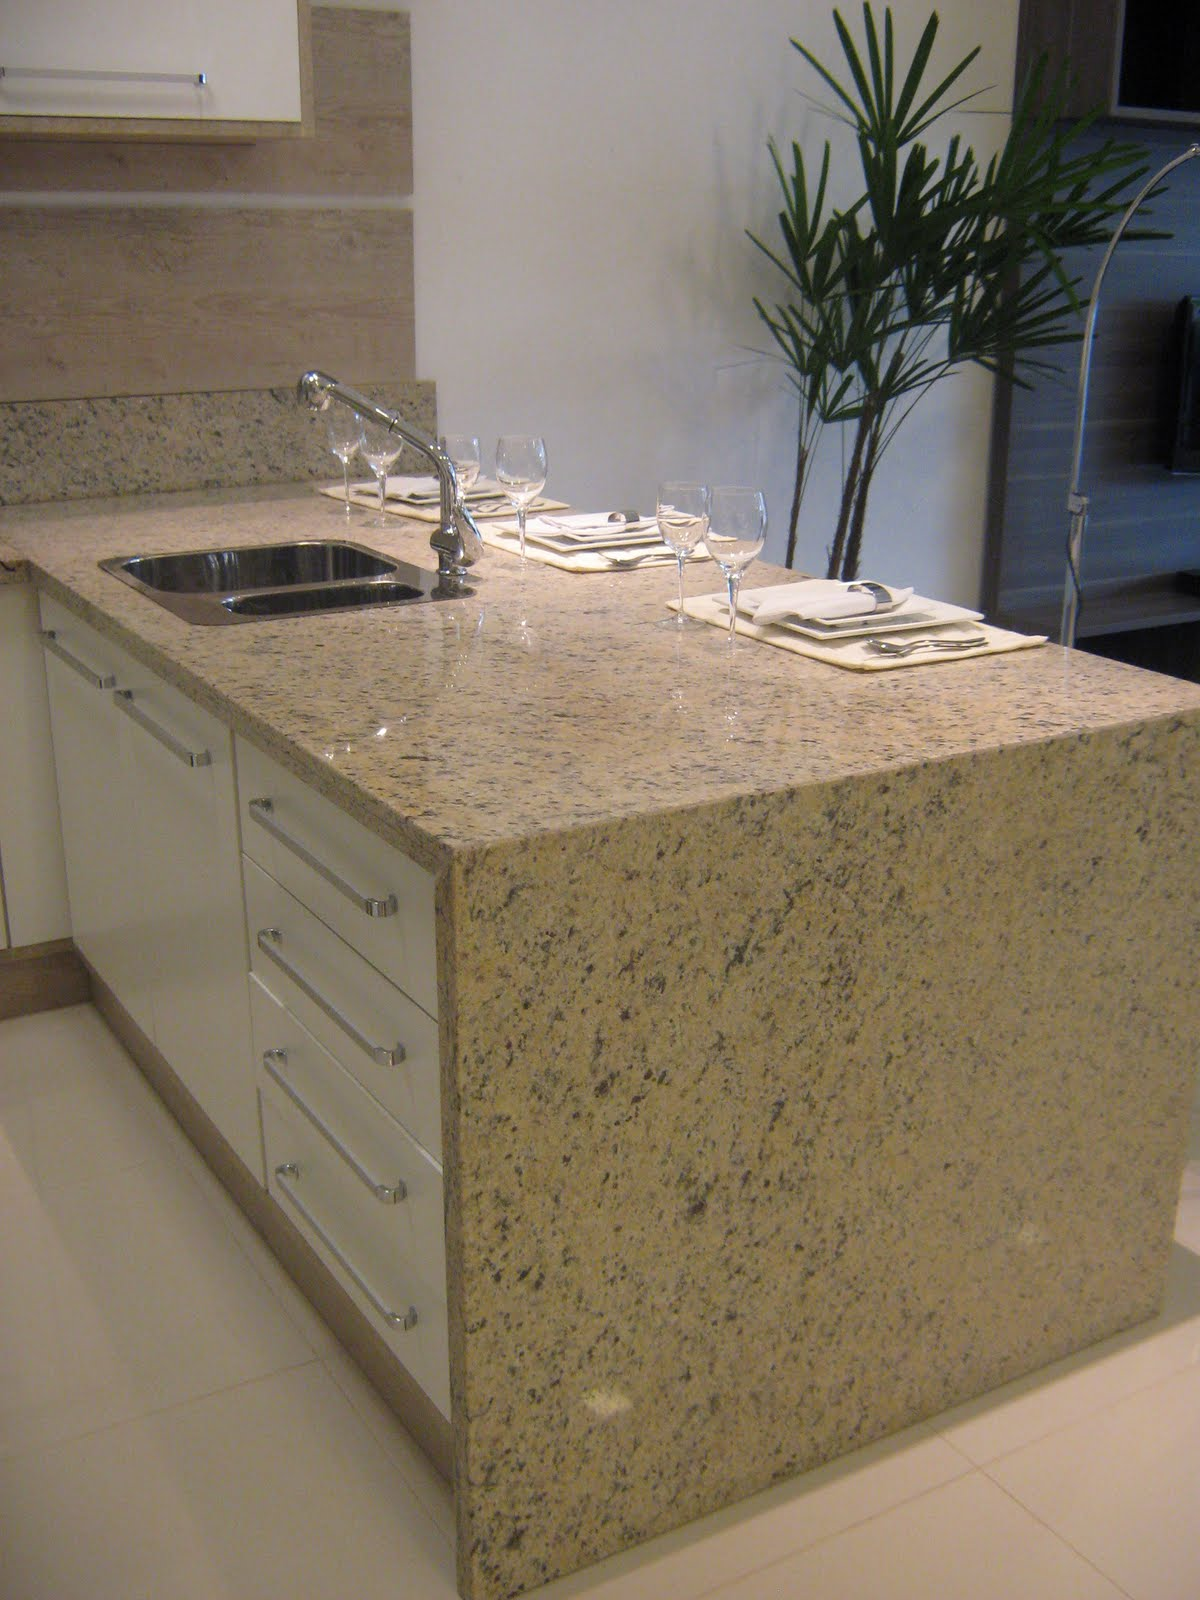 Cozinha de Granito Amarelo Icaraí #845E47 1200x1600 Bancada Banheiro Rj